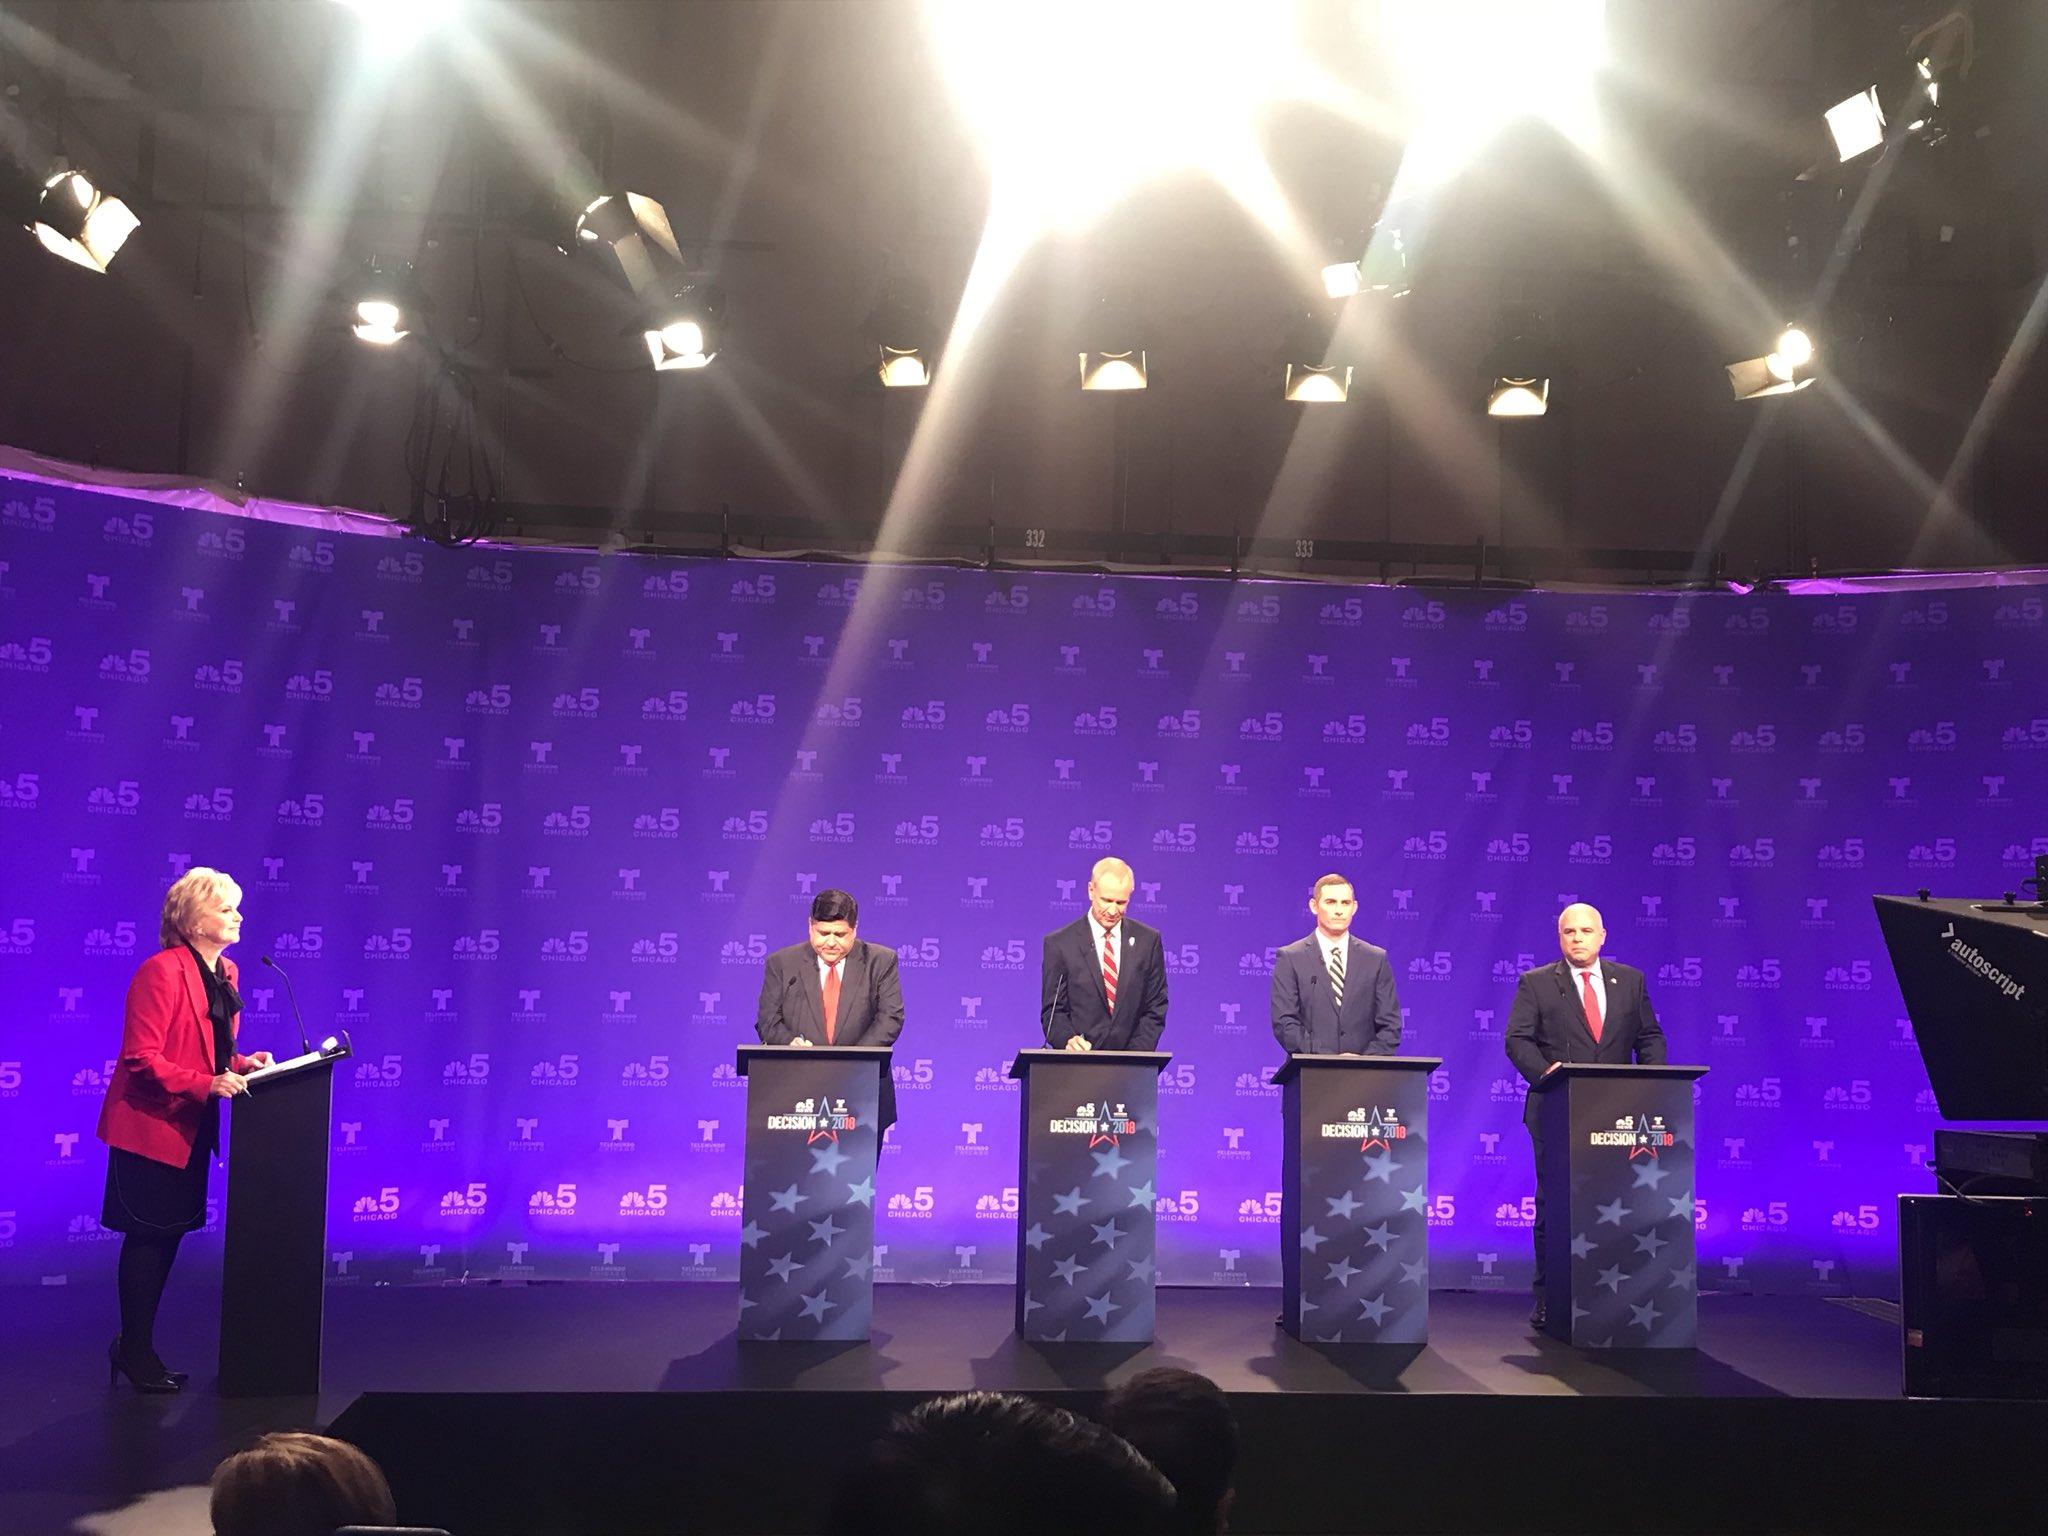 "NBC's Carol Marin, J.B. Pritzker, Gov. Bruce Rauner, Grayson ""Kash"" Jackson, and state Rep. Sam McCann take the stage for Thursday's televised debate. (Twitter/Christian Mitchell)"